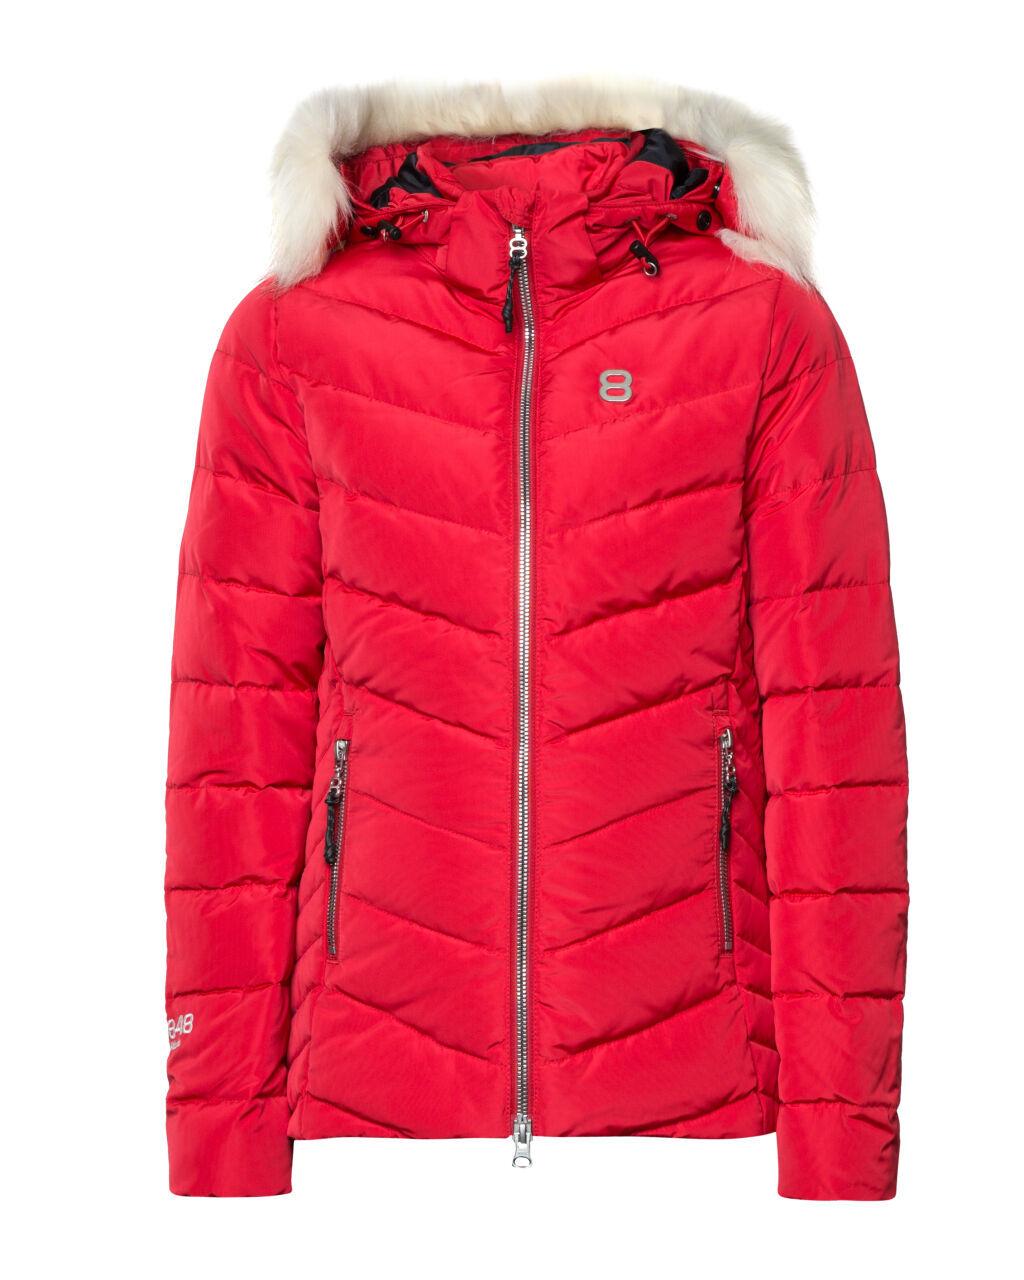 8848 Altitude Vera jacket jrUntuvatakki